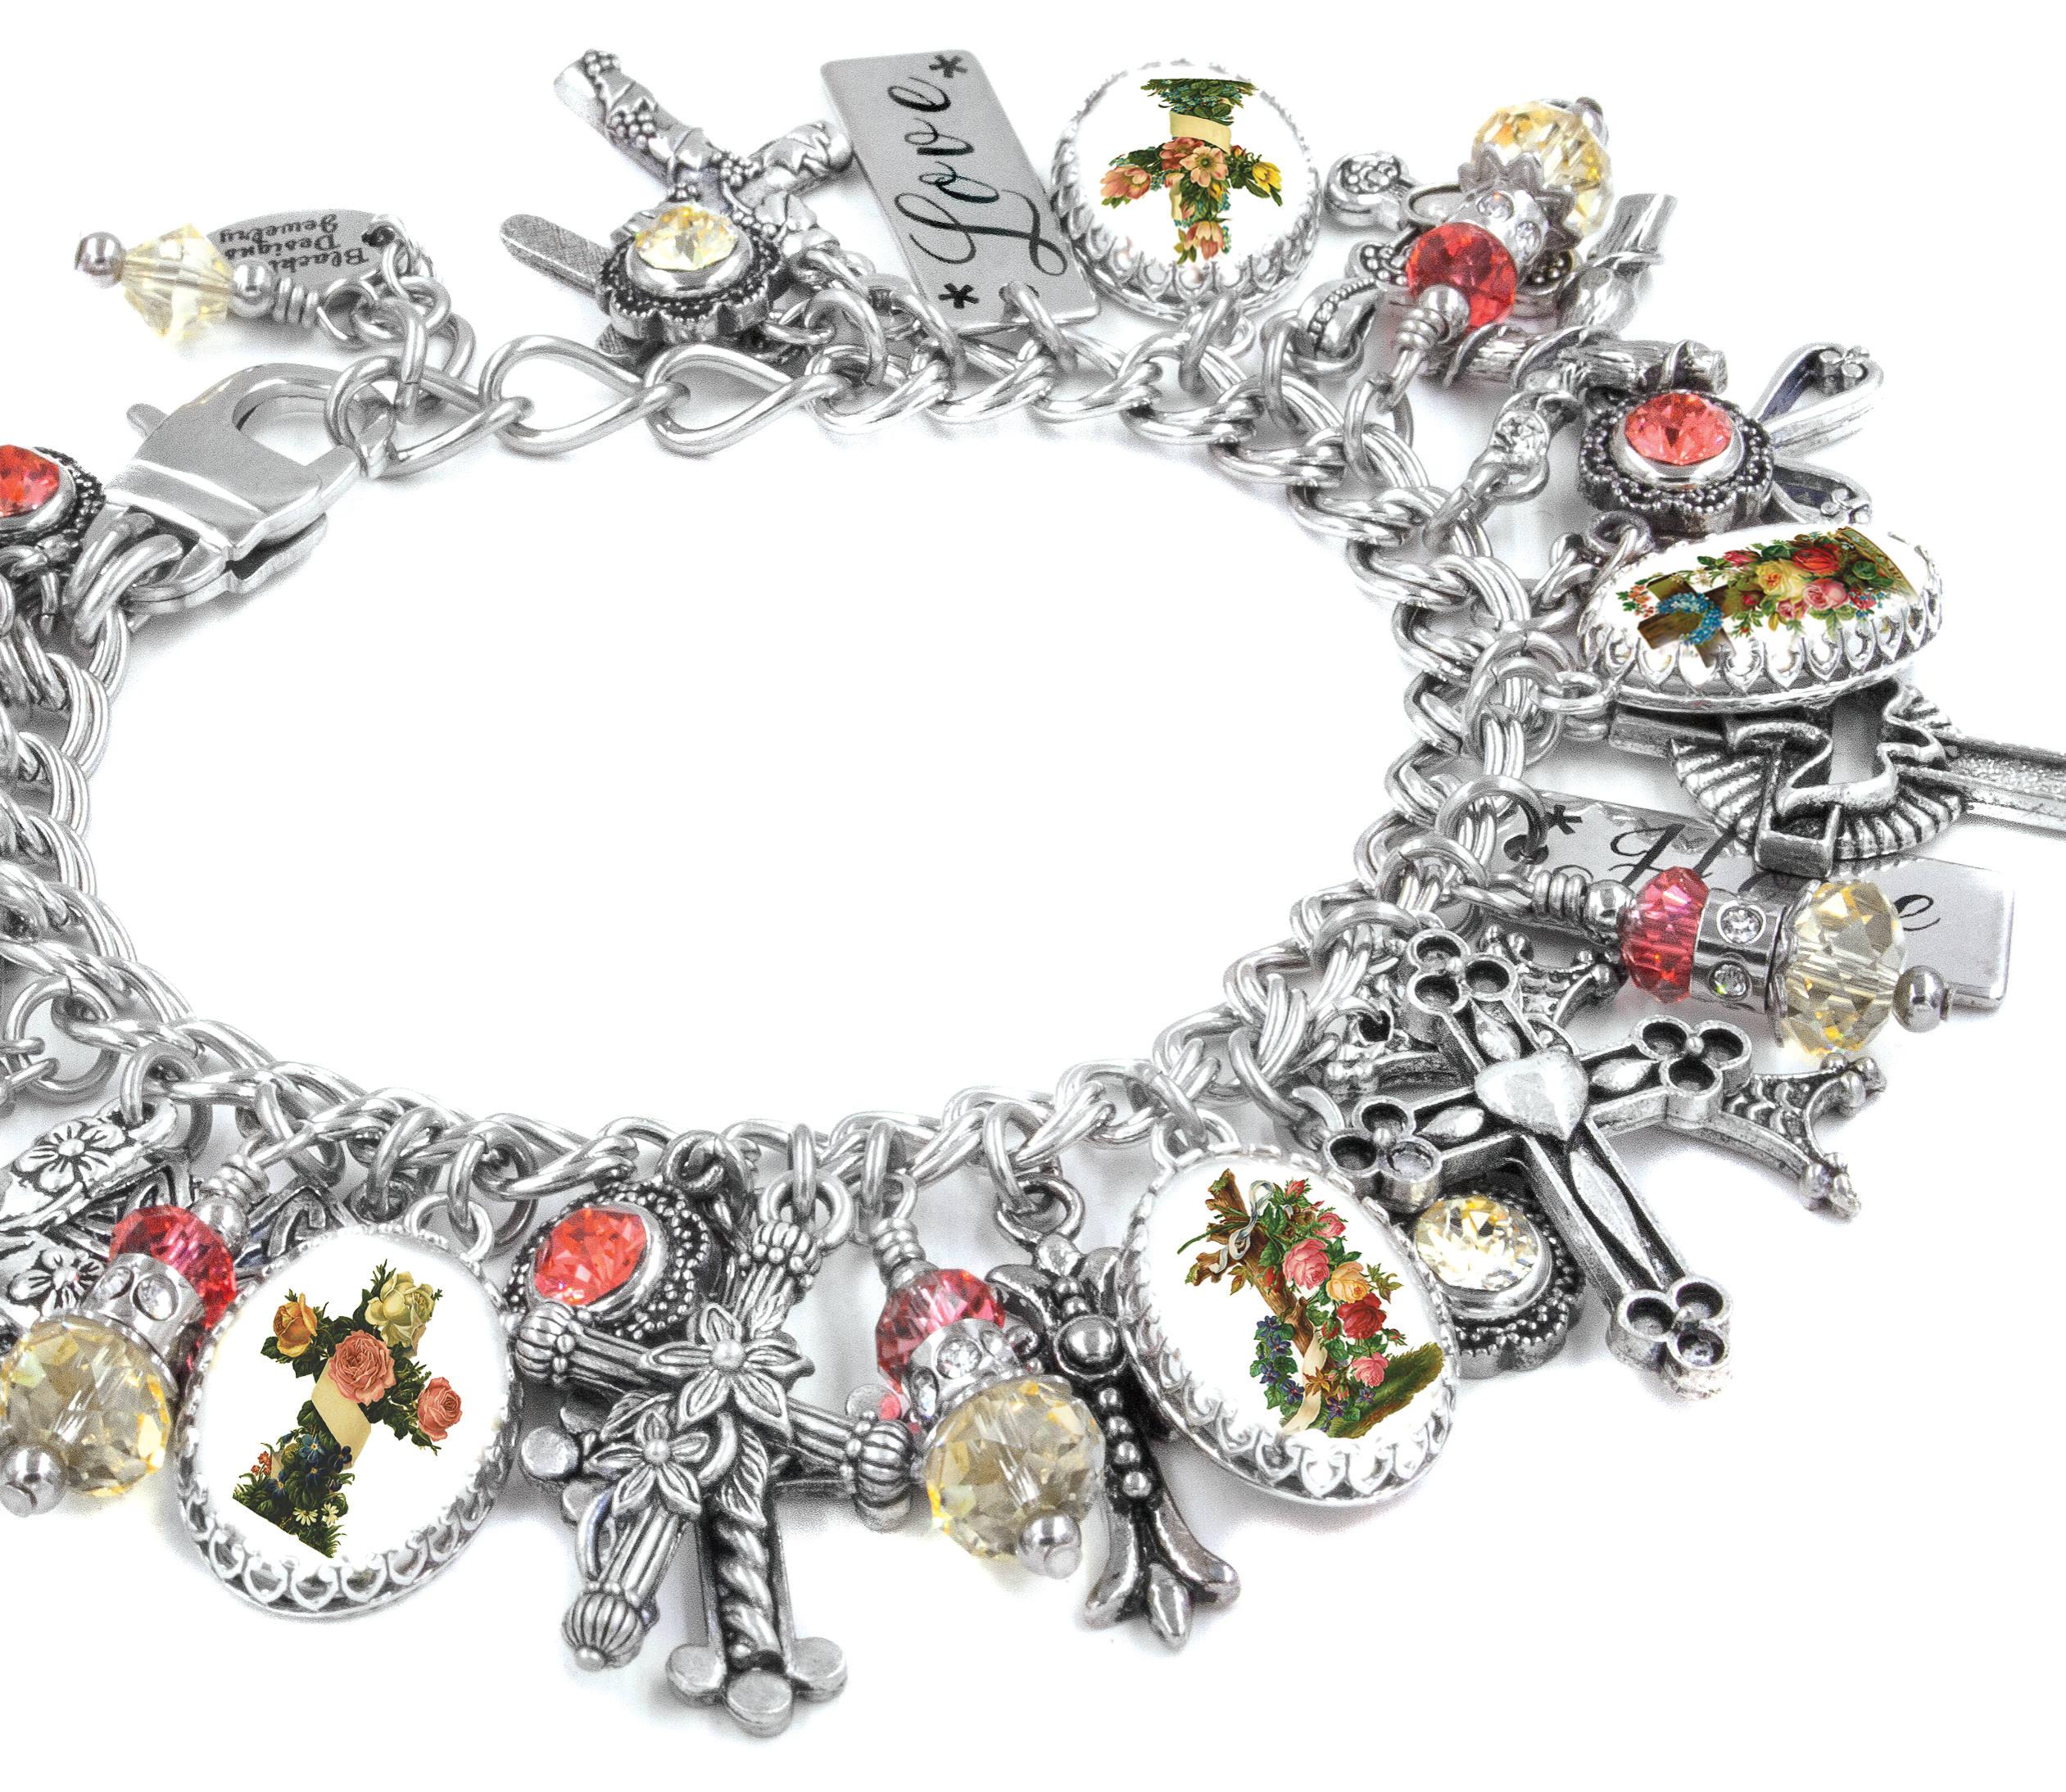 Christian Charm Bracelets: Cross Charm Bracelet Christian Jewelry Religious Cross